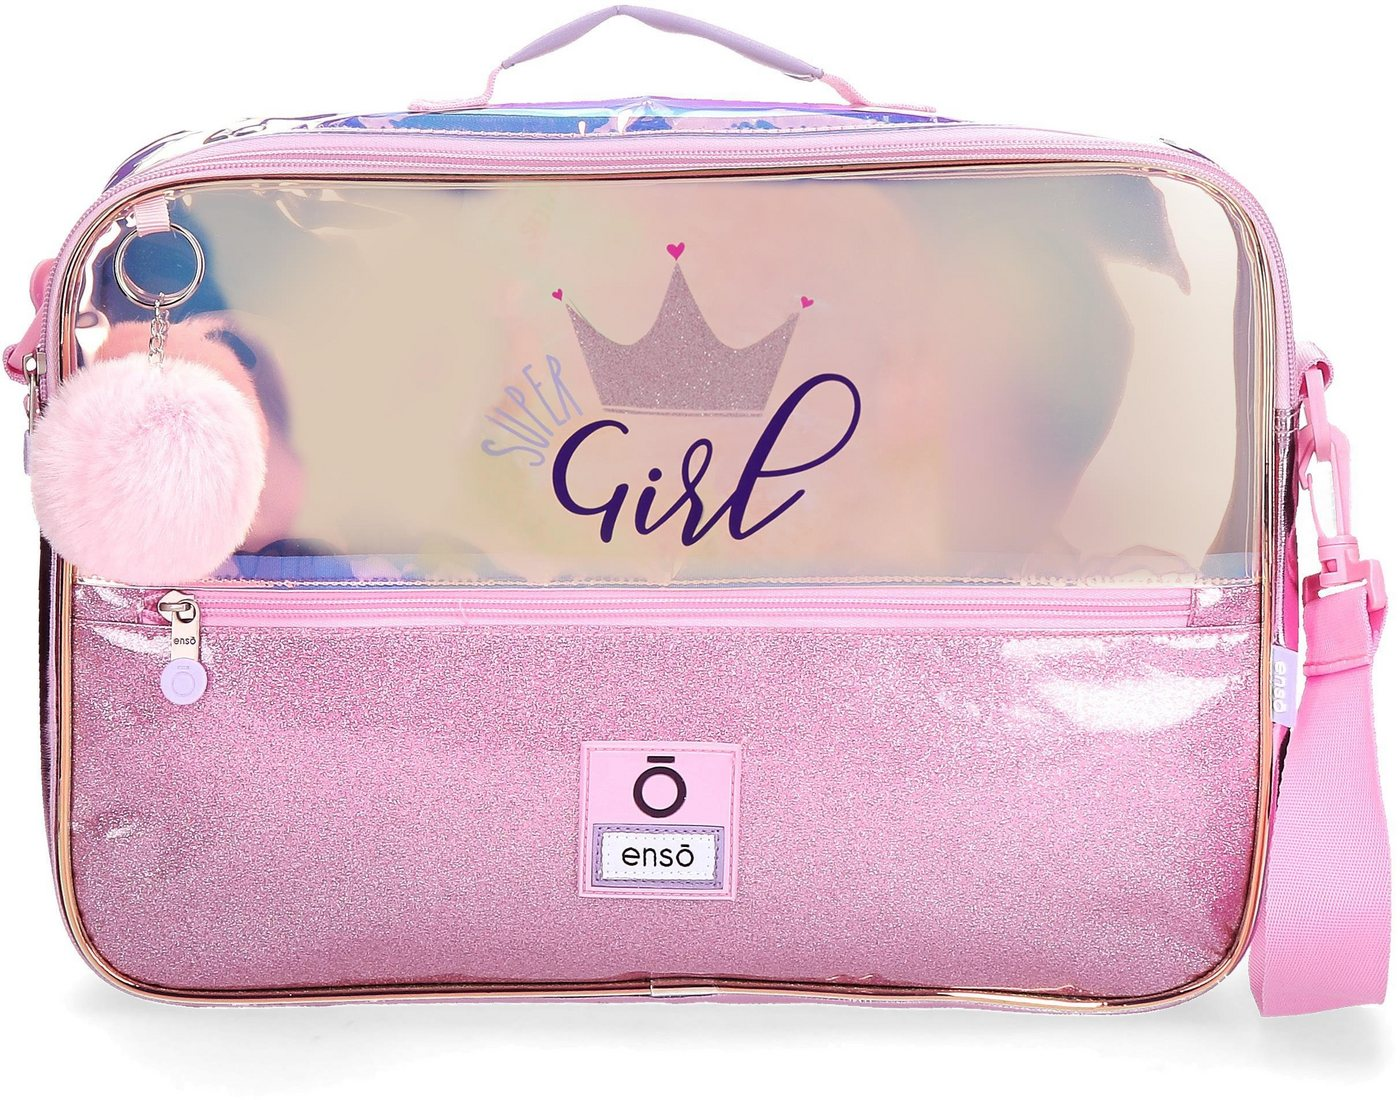 otto - Umhängetasche »Super Girl, rosa«